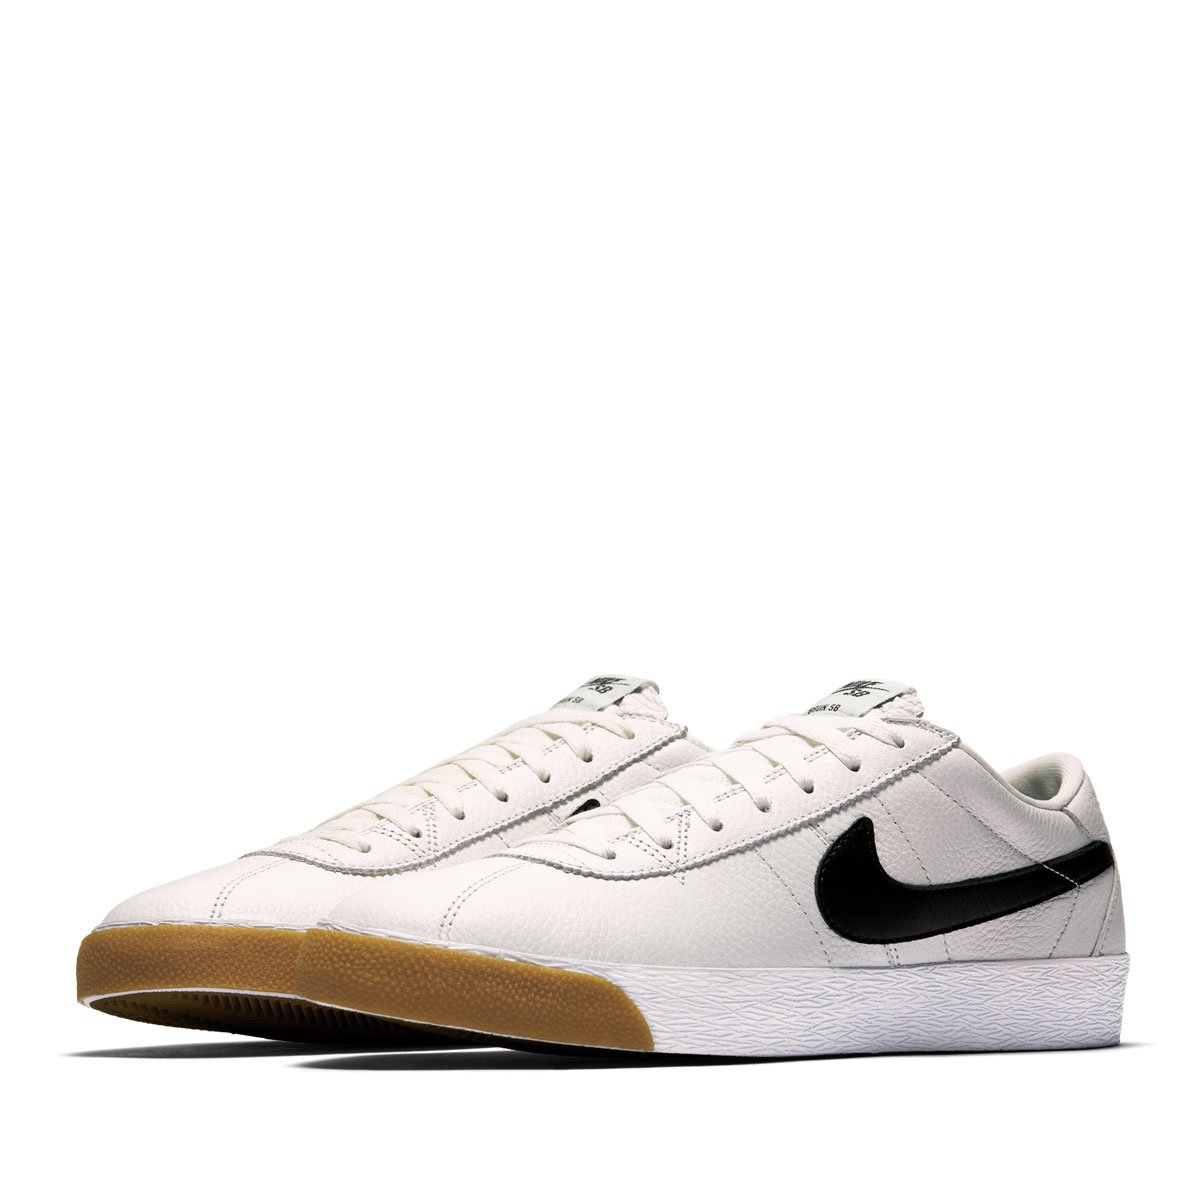 various colors 365a5 9a76e Amazon.com   Men s Nike SB Zoom Bruin Premium SE Skateboarding Shoe    Skateboarding